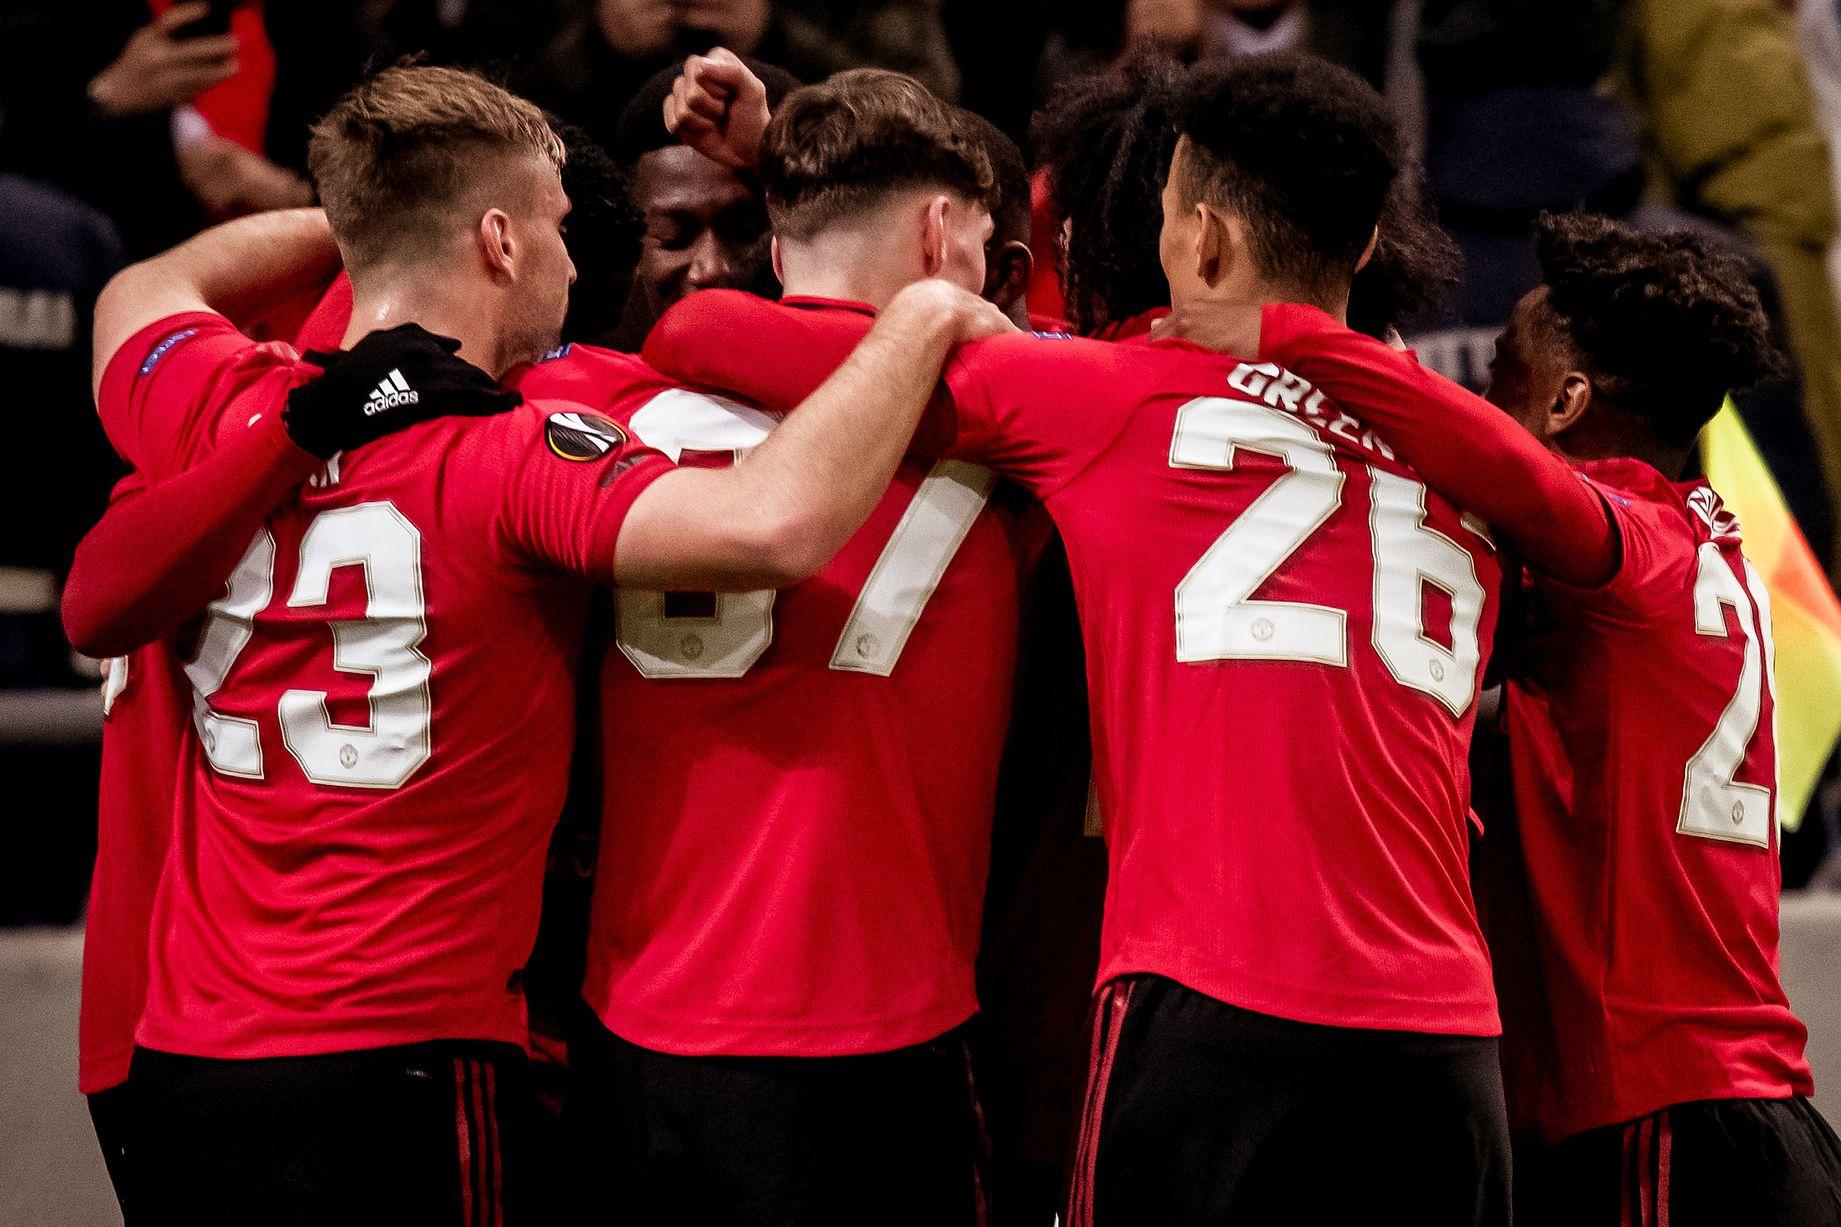 Ole Gunnar Solskjaer sent warning over 'panic buy' as Man Utd consider striker signing - Bóng Đá